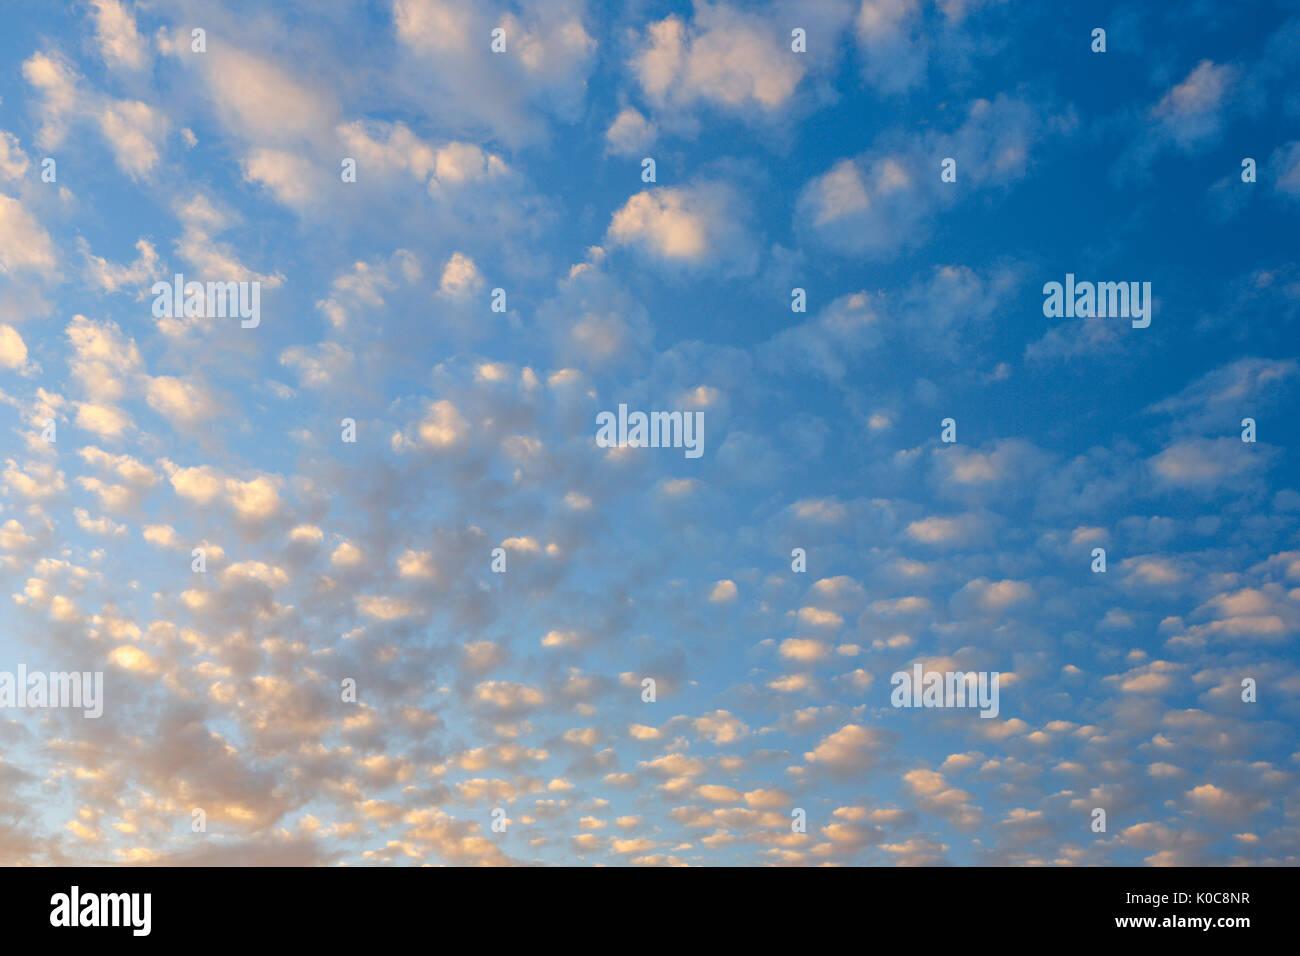 Wolken am blauen Himmel - Stock Image